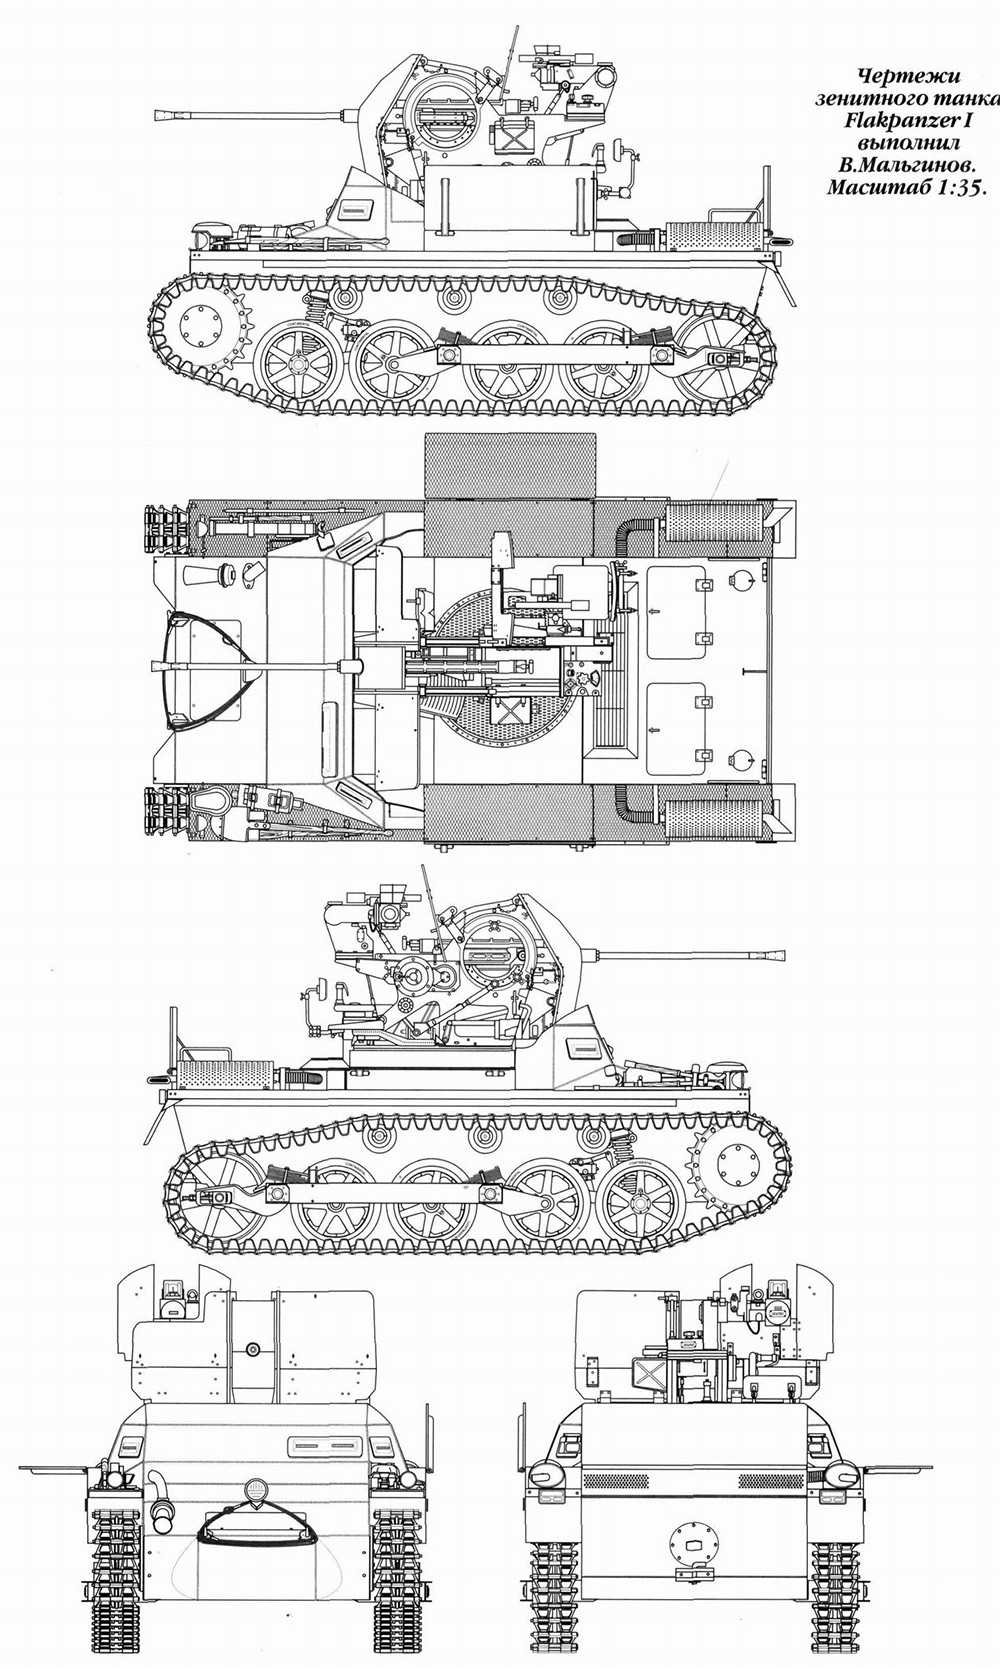 Чертеж зенитного танка «FlakPanzer»-I